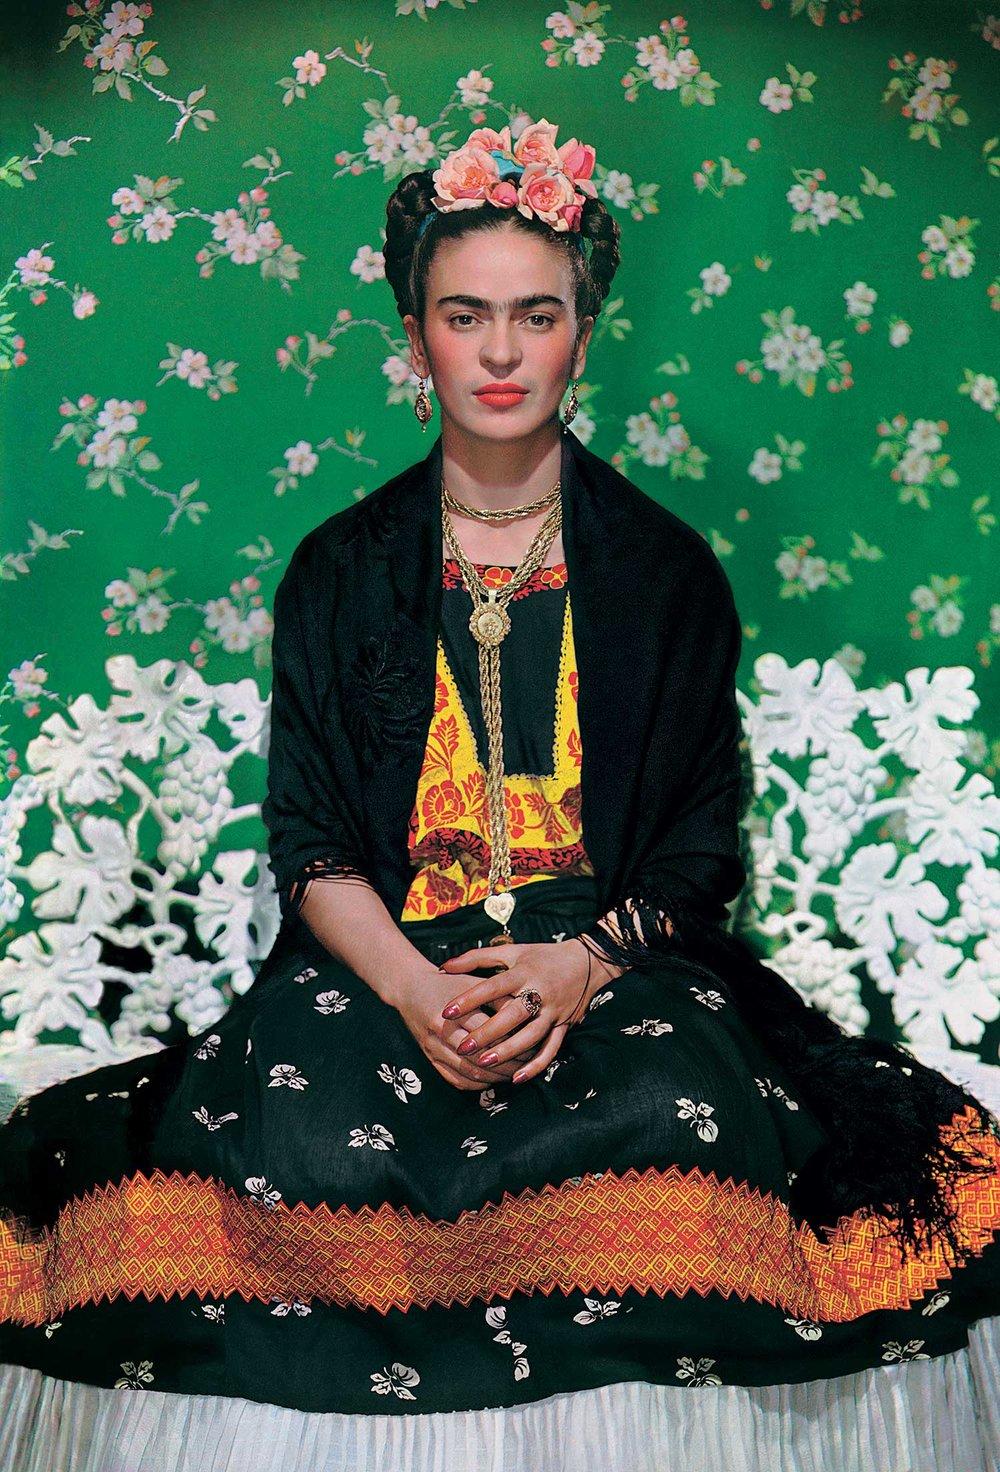 Image credit: Frida on the bench, 1939, photograph by Nickolas Muray © Nickolas Muray Photo Archives